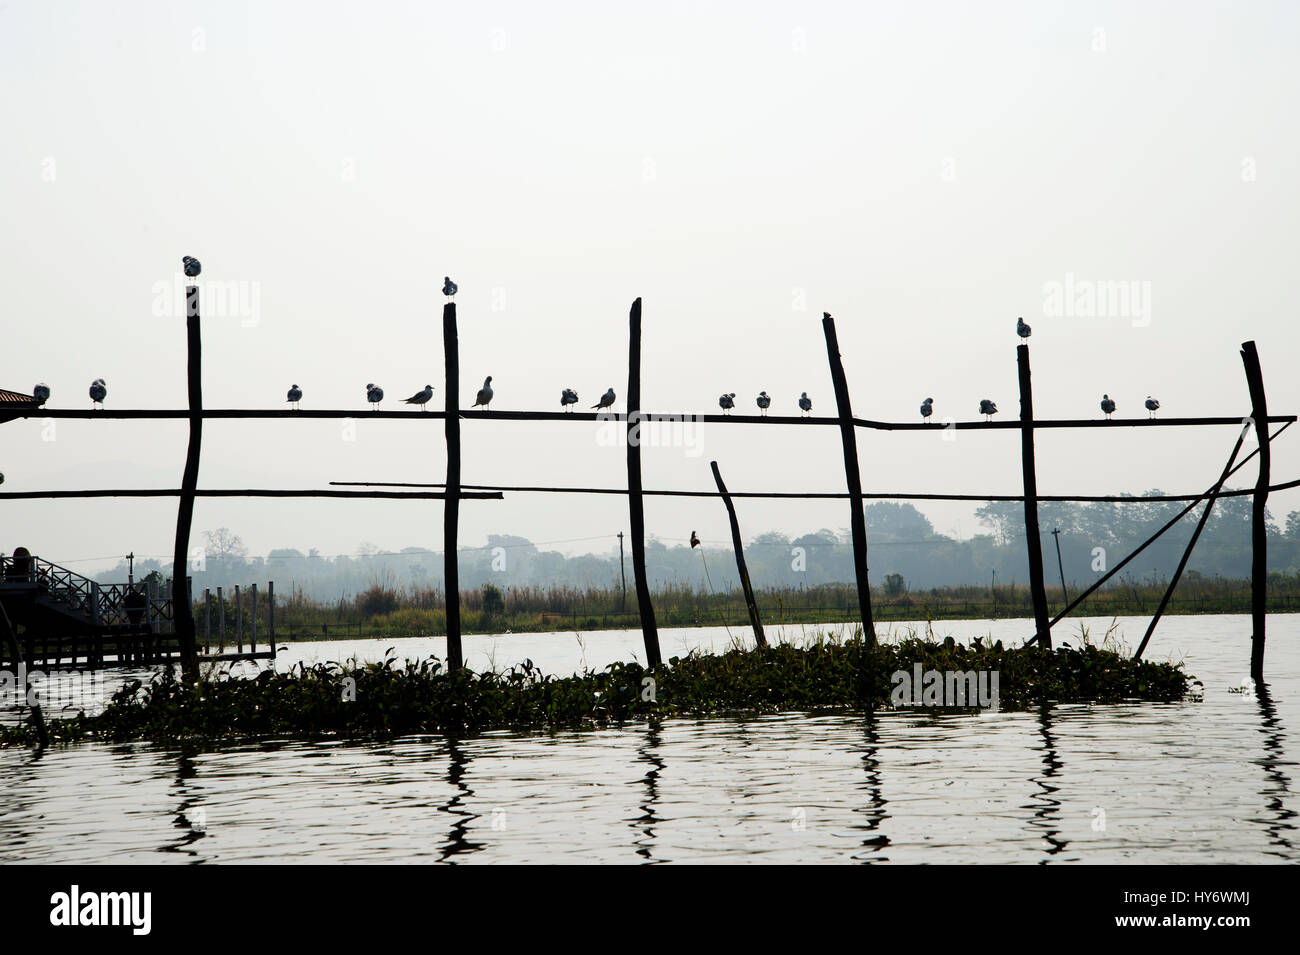 Myanmar (Burma). Inle lake. Birds perched on poles. Stock Photo